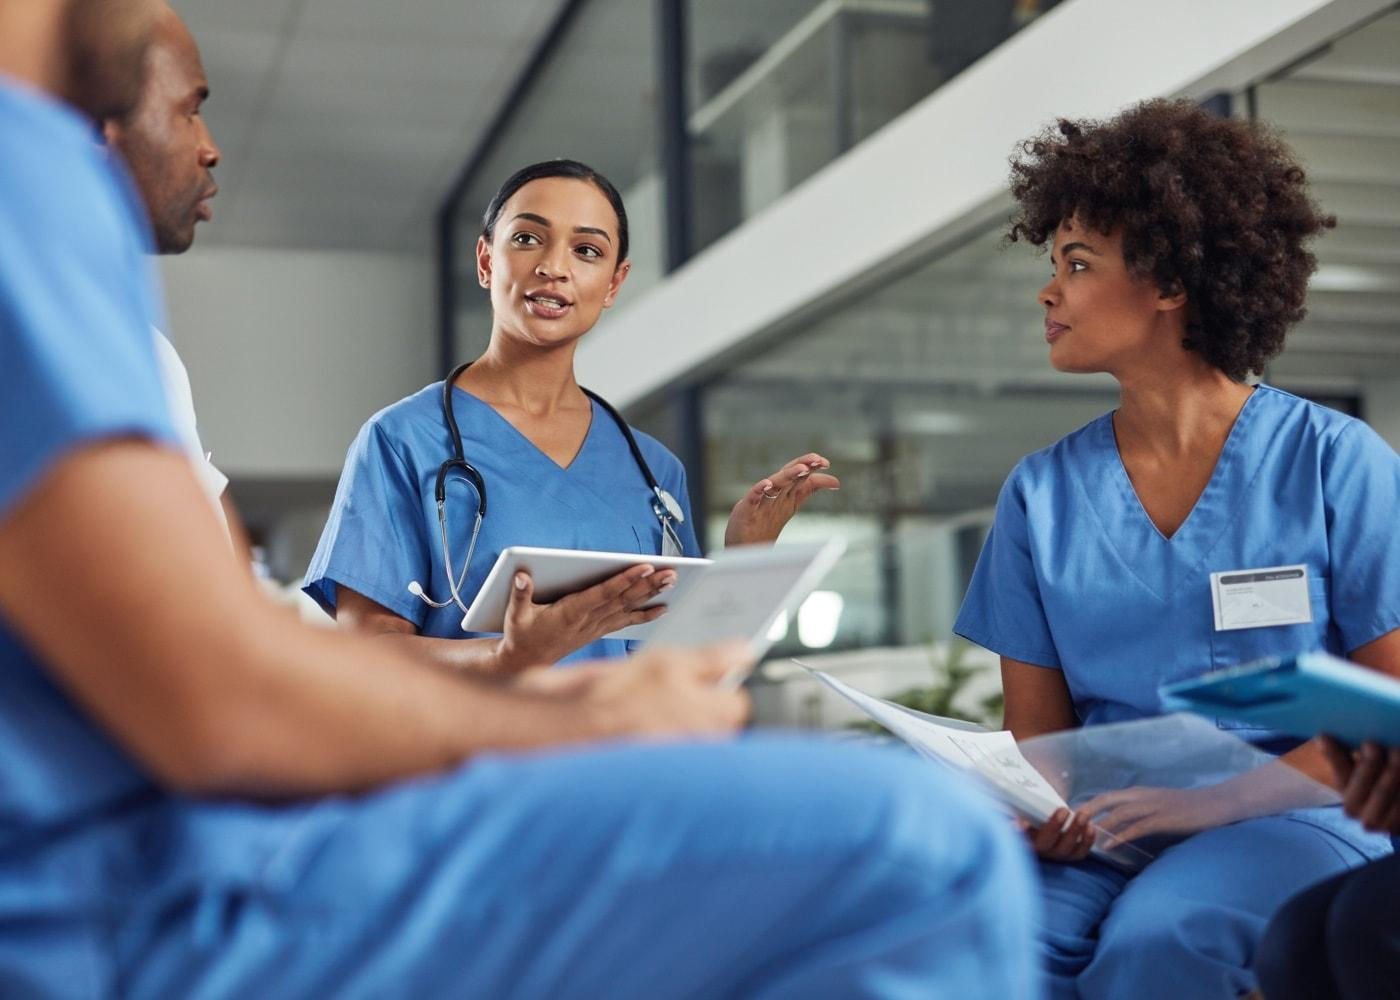 MedicalPractioners